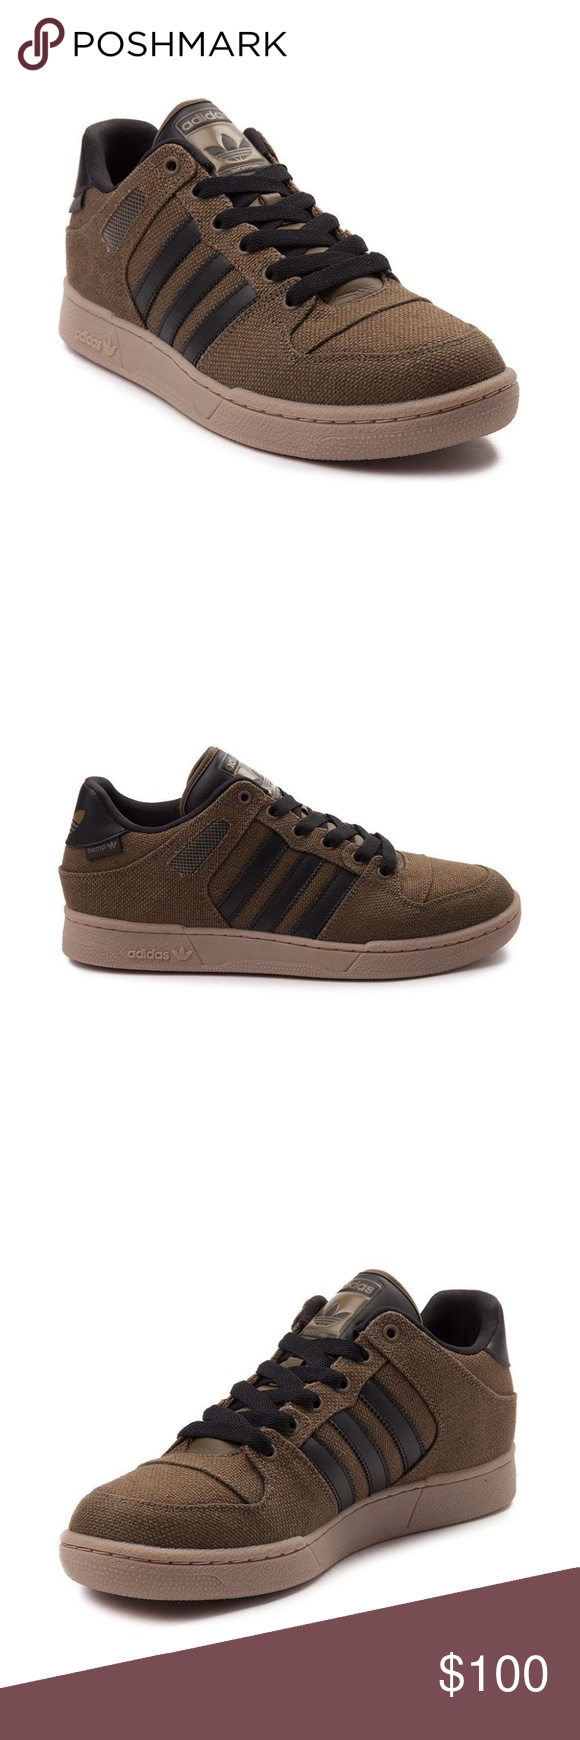 a5e4c4e63f8 ADIDAS Bucktown ST Sneakers Hemp NWOB EVH 791004 ADIDAS Bucktown ST New  Mens Shoe Olive Green Black Hemp NWOB EVH 791004 Kick it in classic style  with the ...